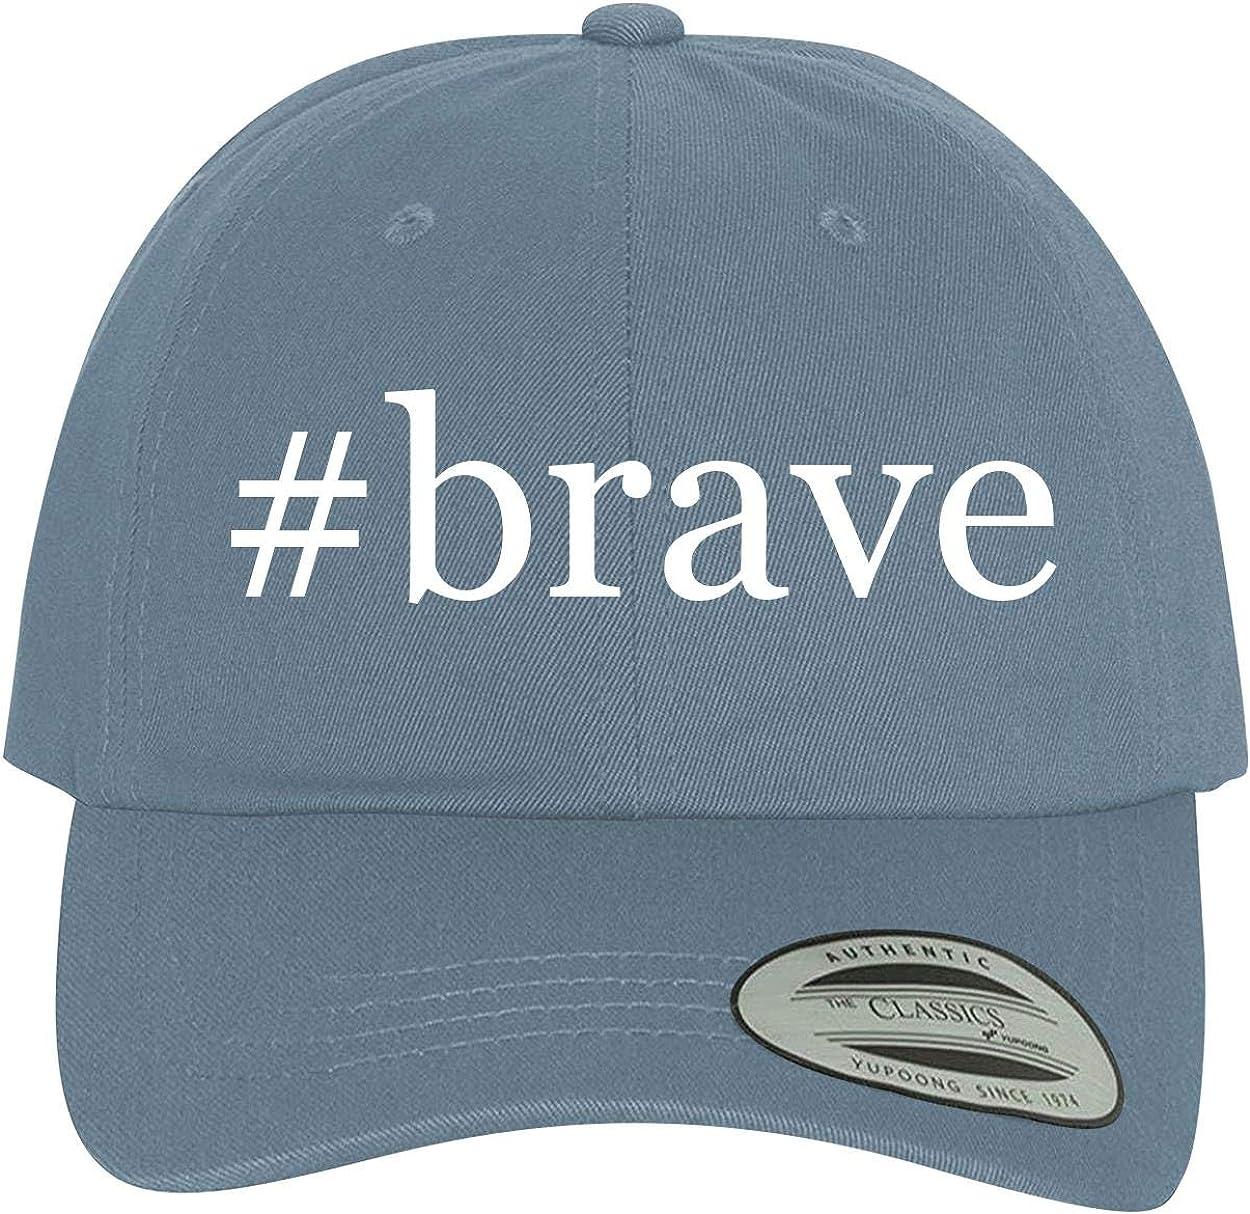 Comfortable Dad Hat Baseball Cap BH Cool Designs #Brave